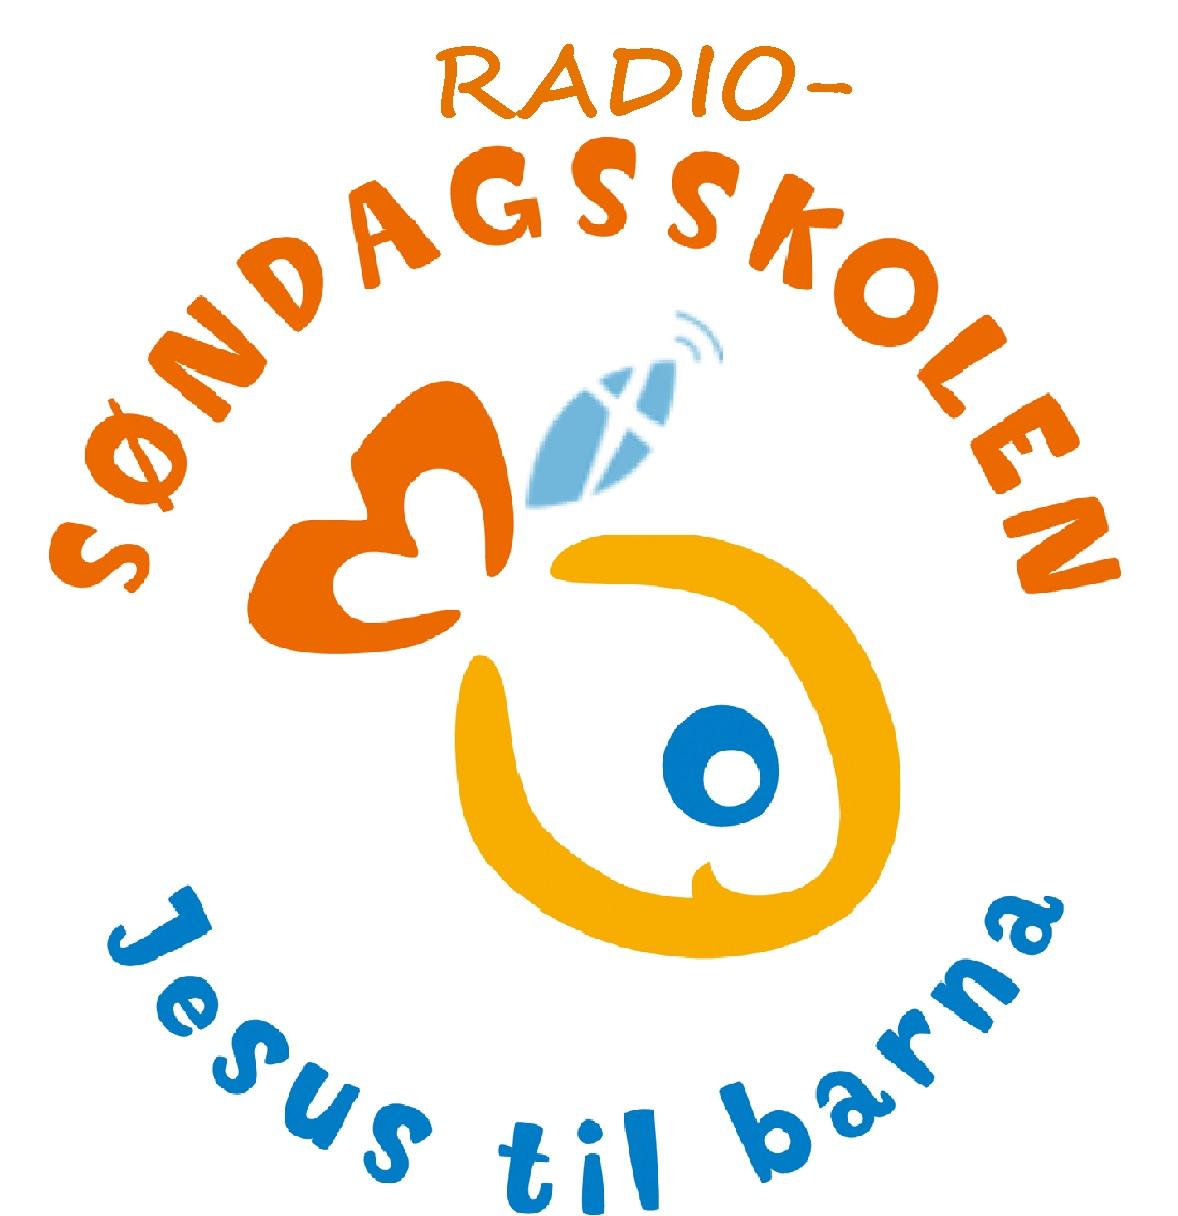 Radiosøndagsskolen